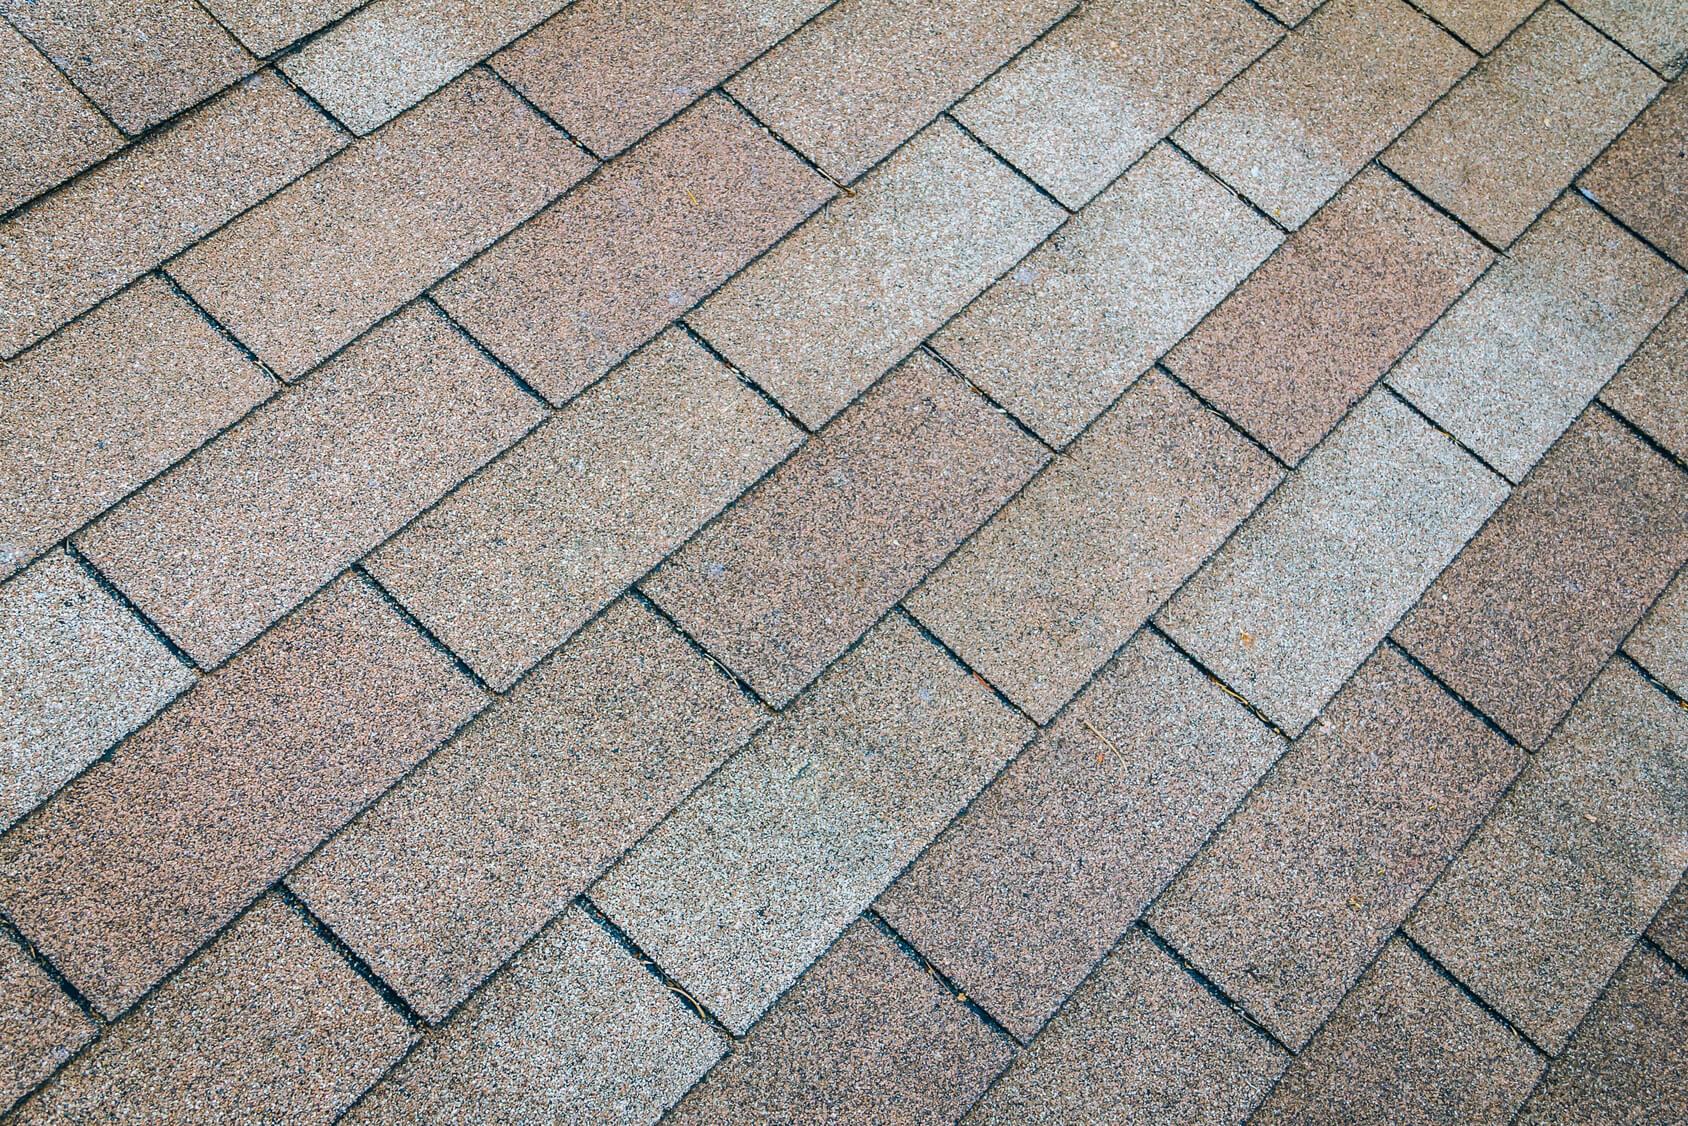 asphalt roof power washing in minneapolis